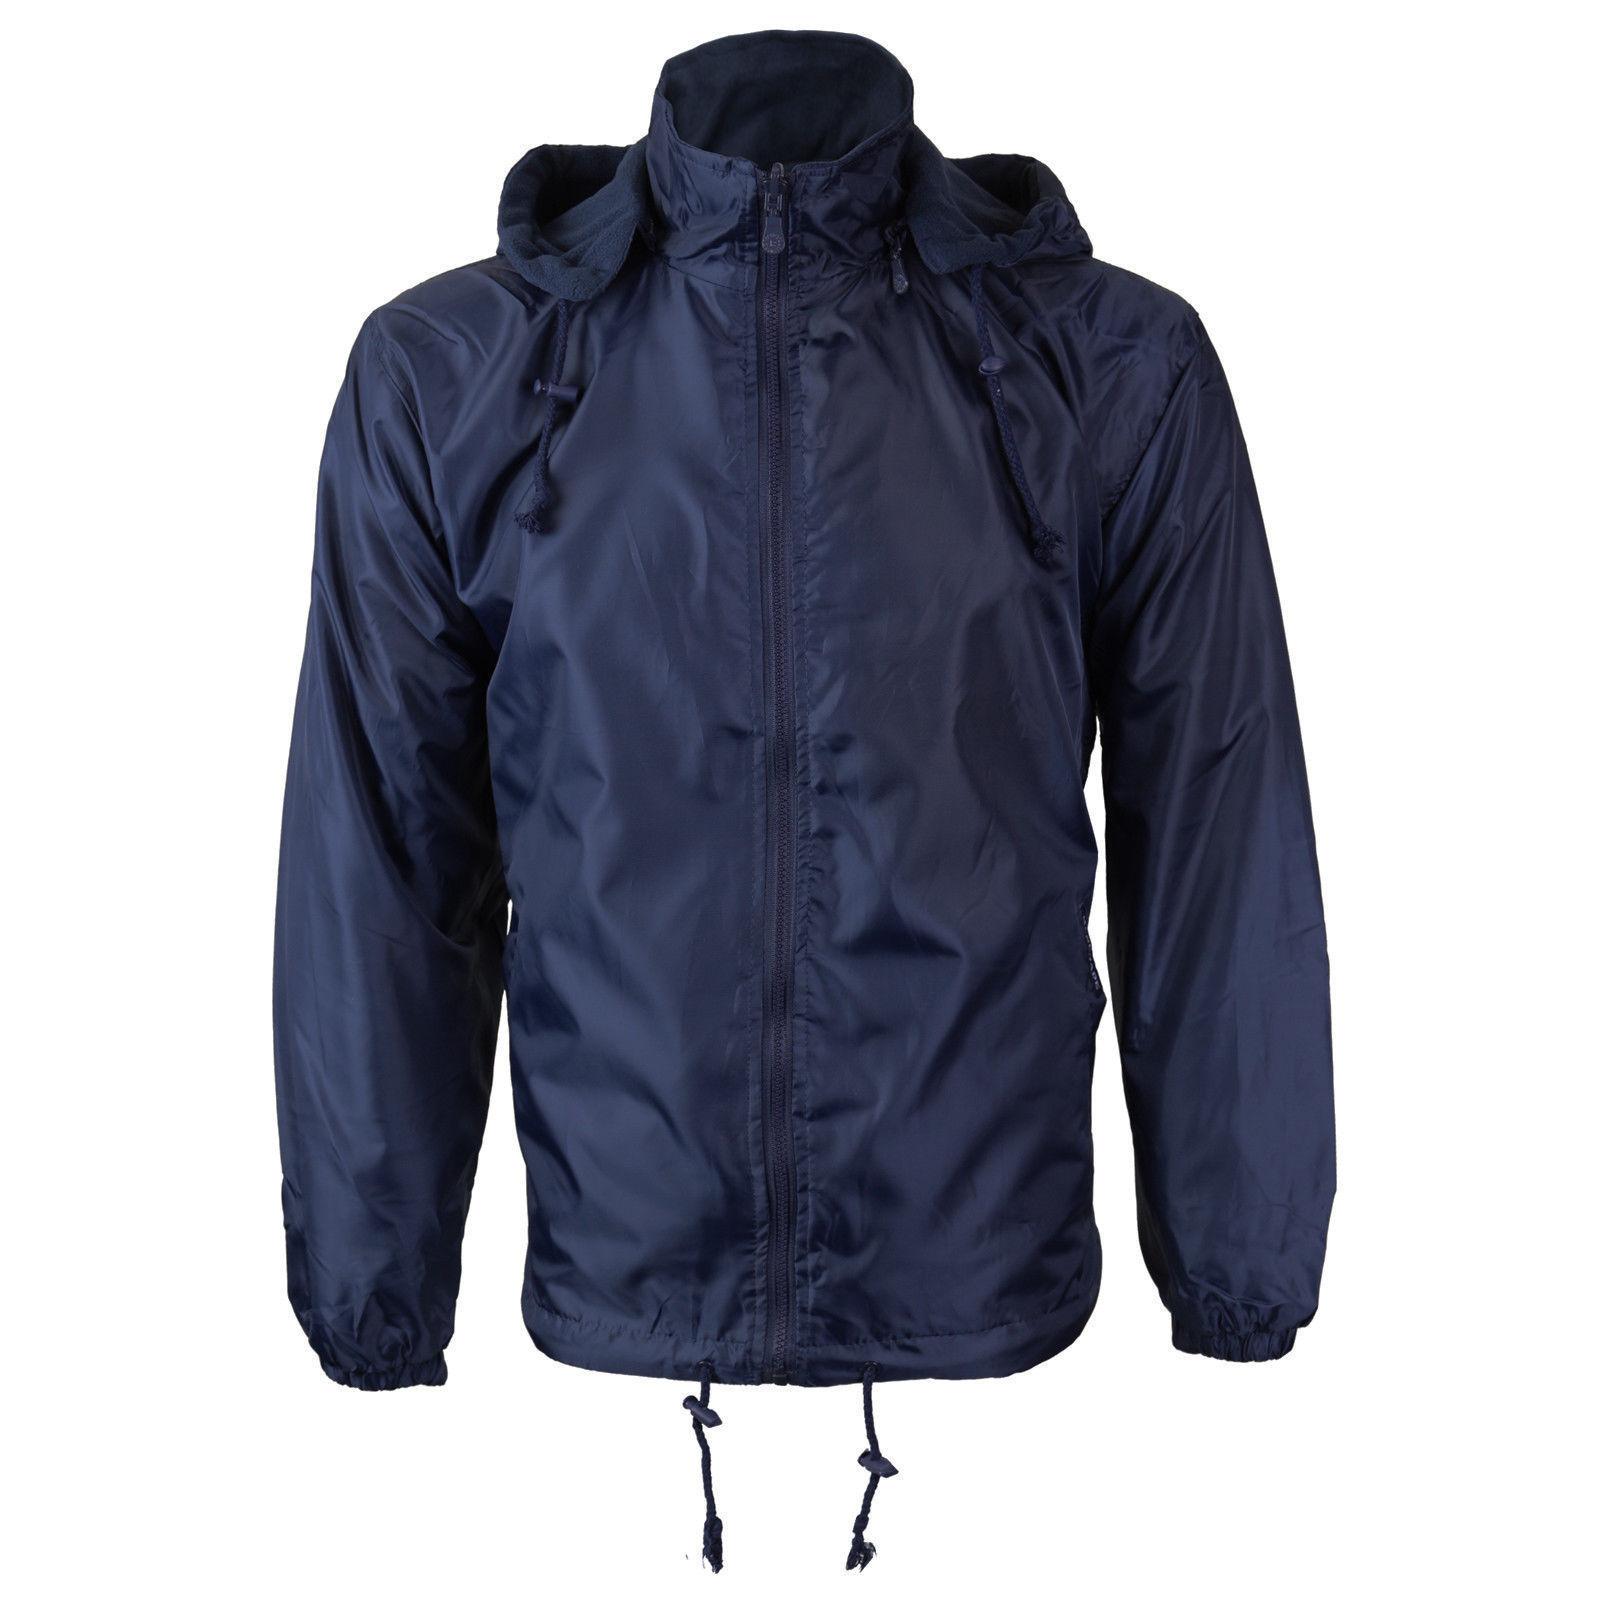 Men's Water Resistant Fleece Lined Hooded Windbreaker Rain Jacket NEW W/ DEFECT